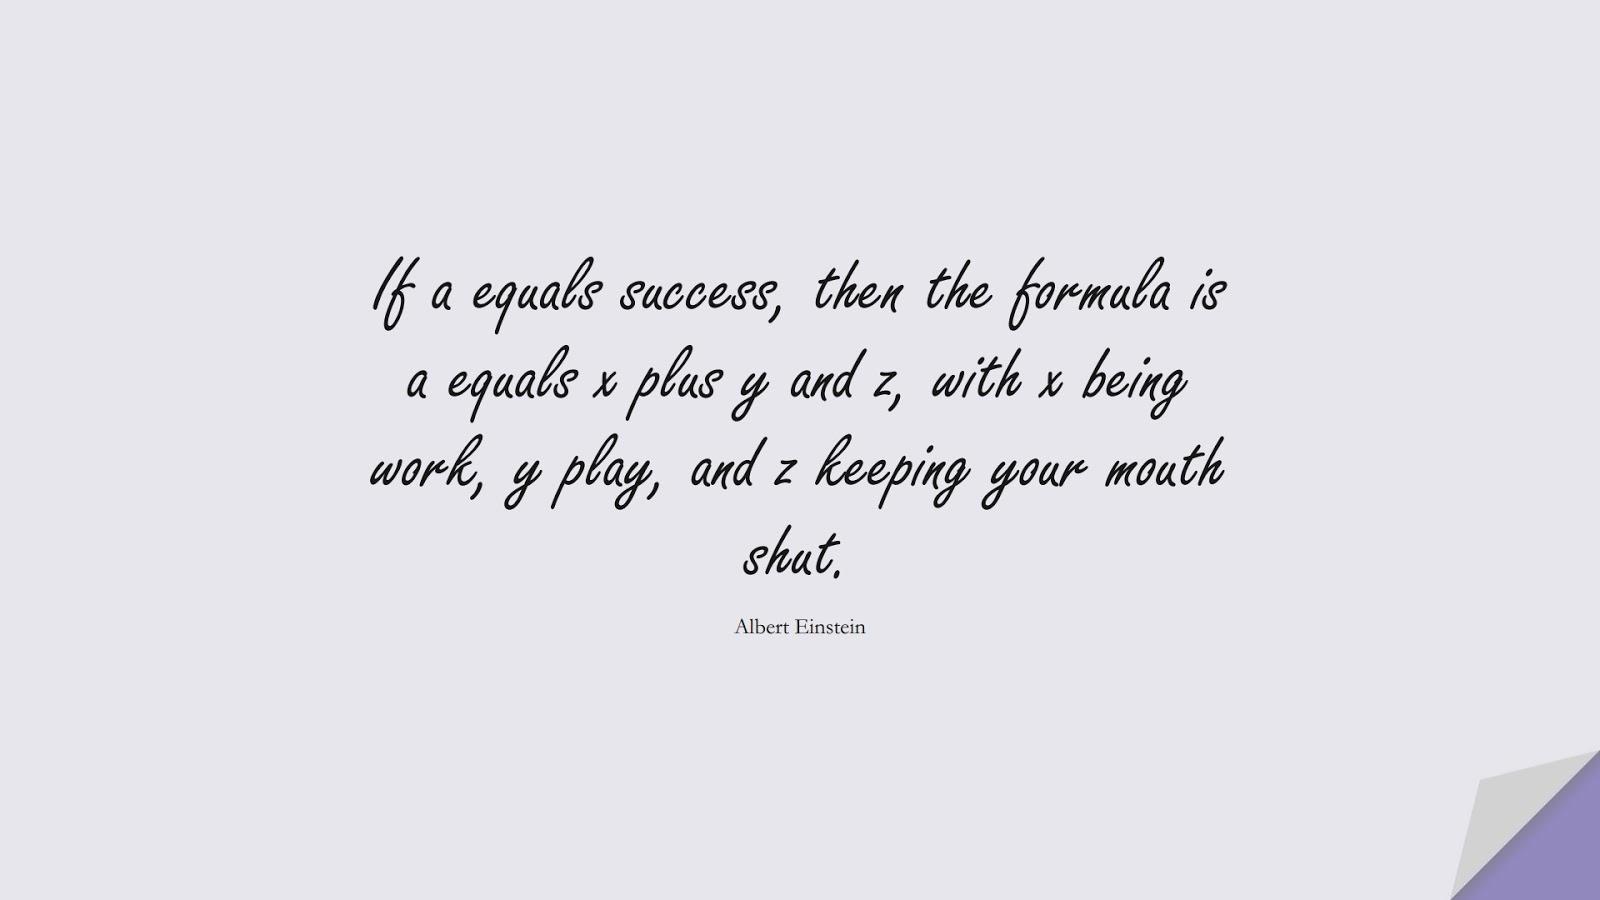 If a equals success, then the formula is a equals x plus y and z, with x being work, y play, and z keeping your mouth shut. (Albert Einstein);  #AlbertEnsteinQuotes